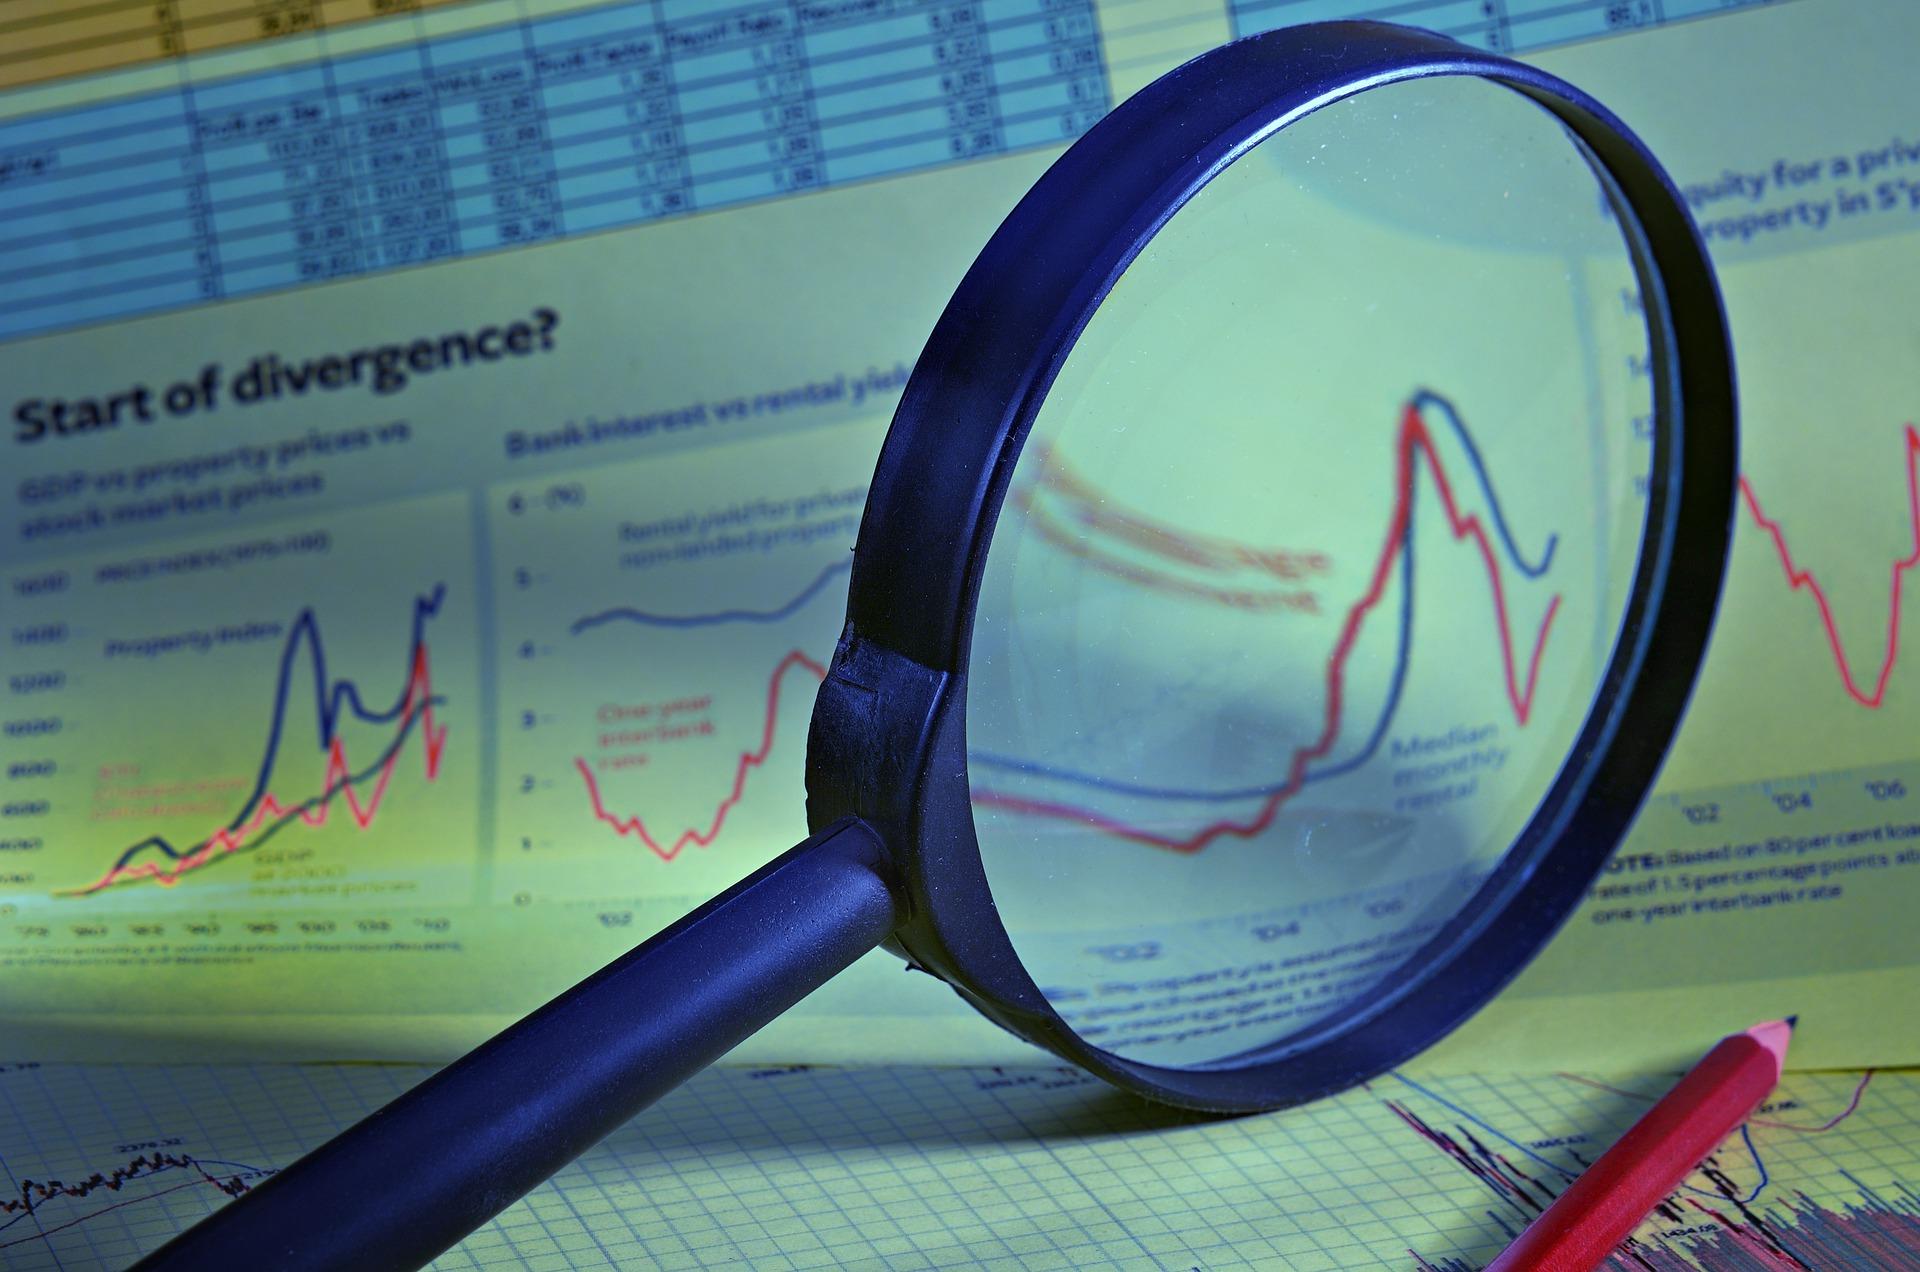 Chartanalyse im Trading: VTAD